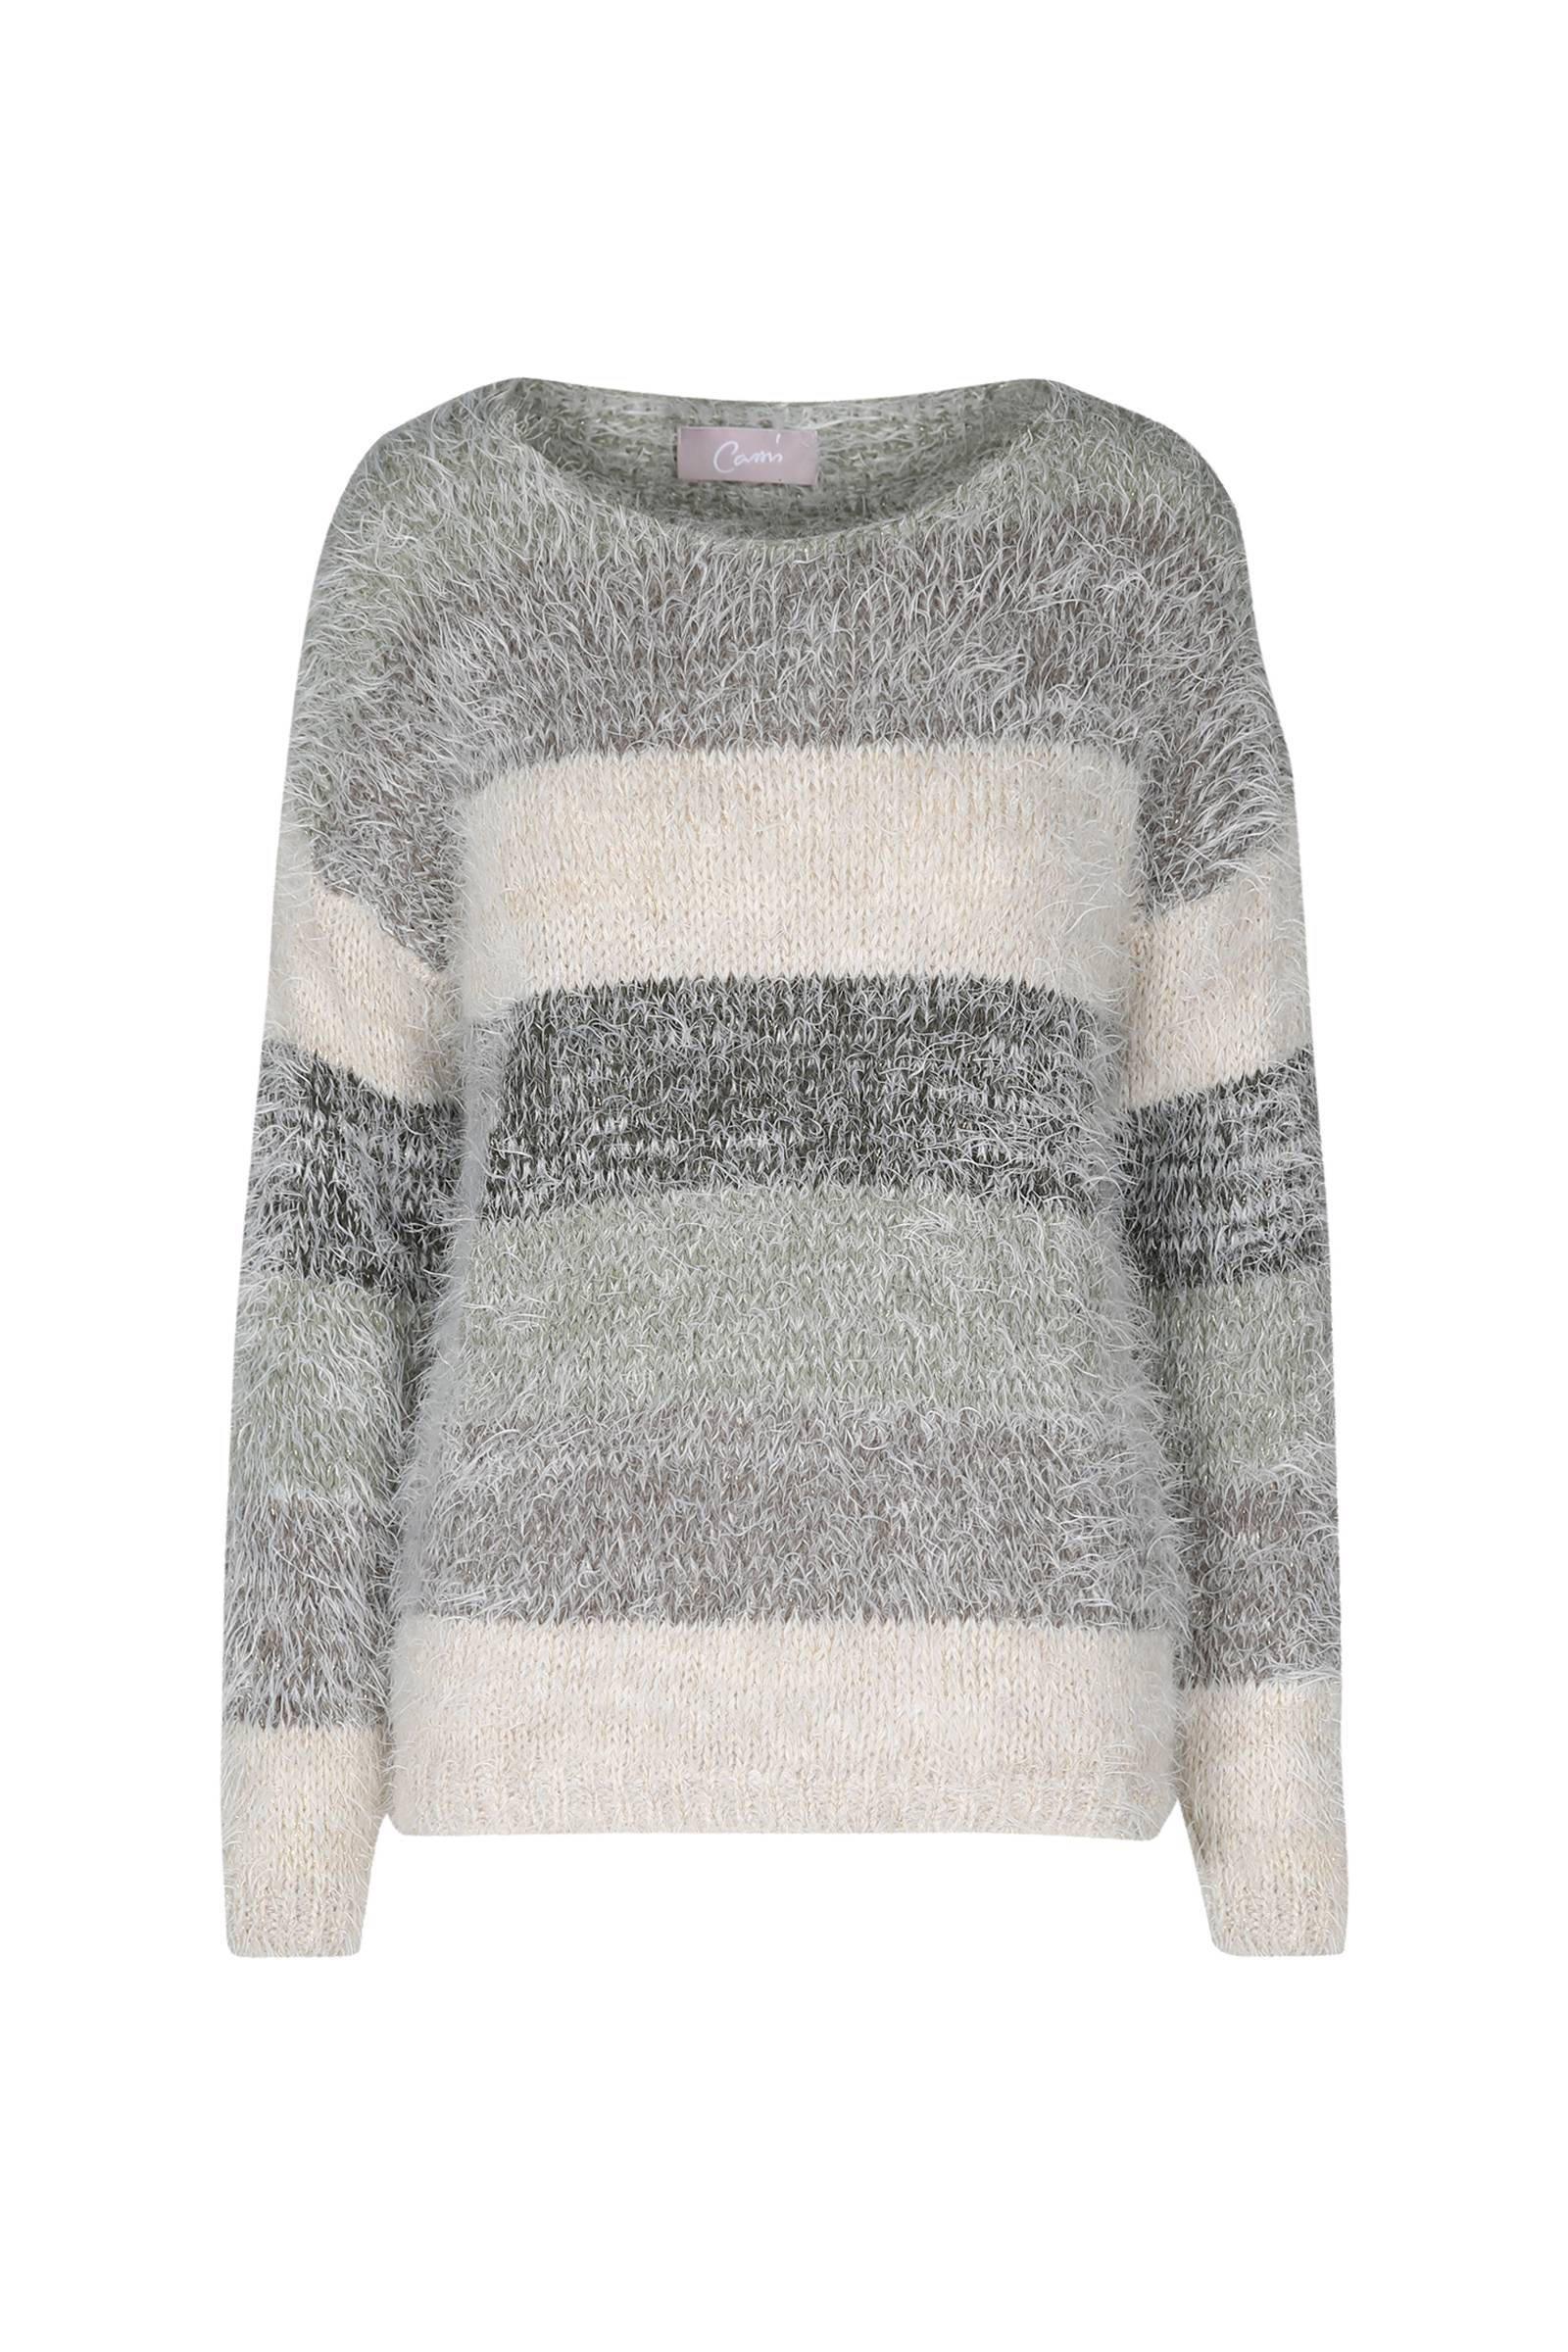 Cassis fluffy trui met parels | wehkamp